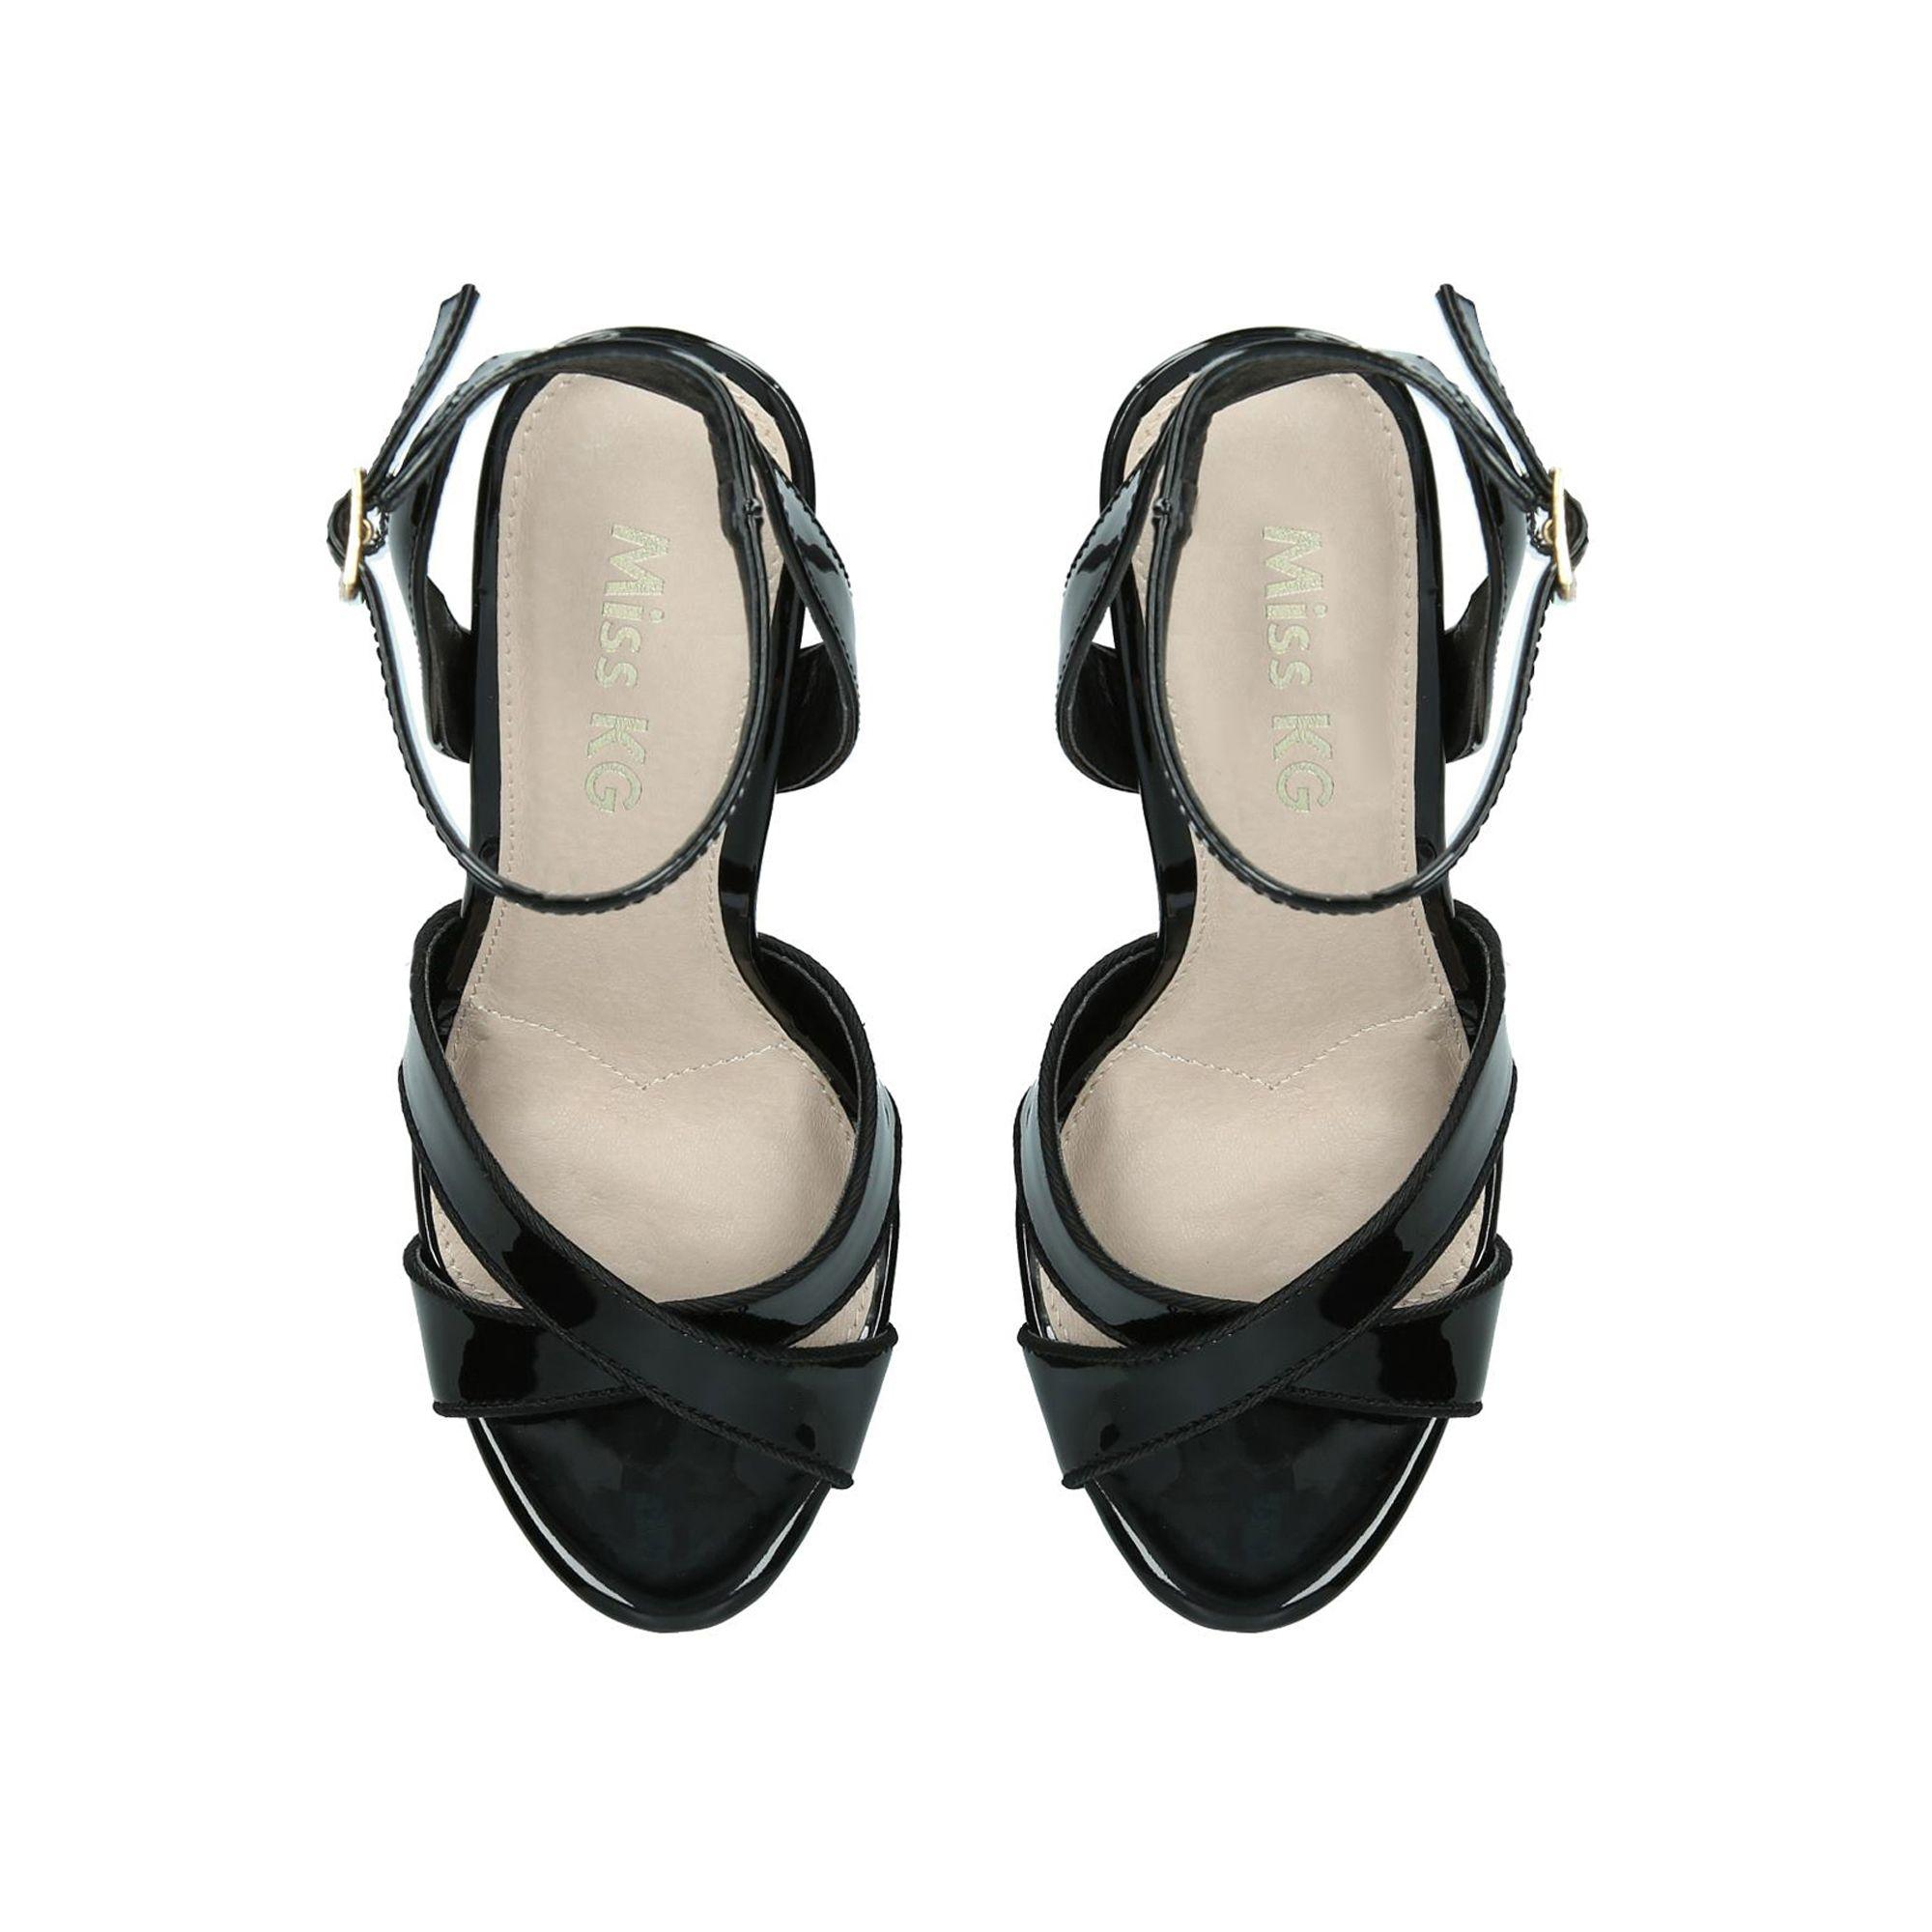 672d6749339 Miss Kg Black  pam  High Heel Sandals in Black - Save 51% - Lyst